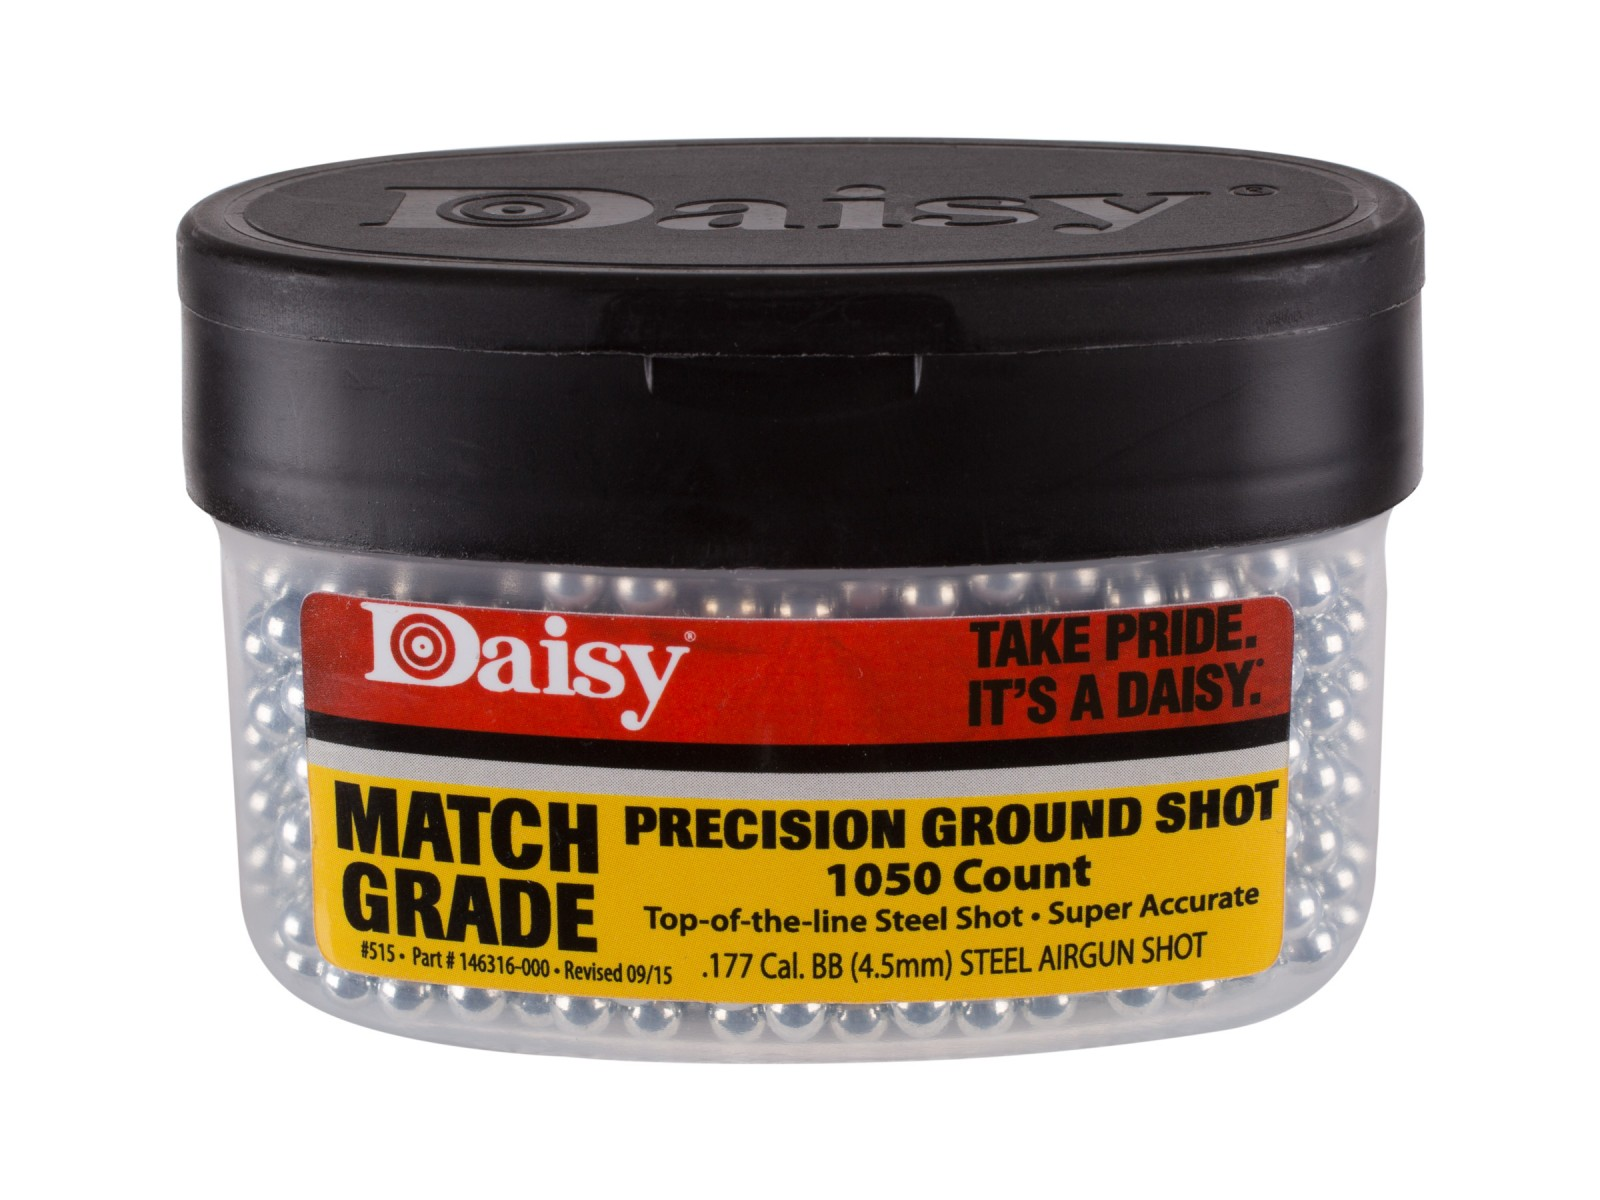 Daisy Match Grade